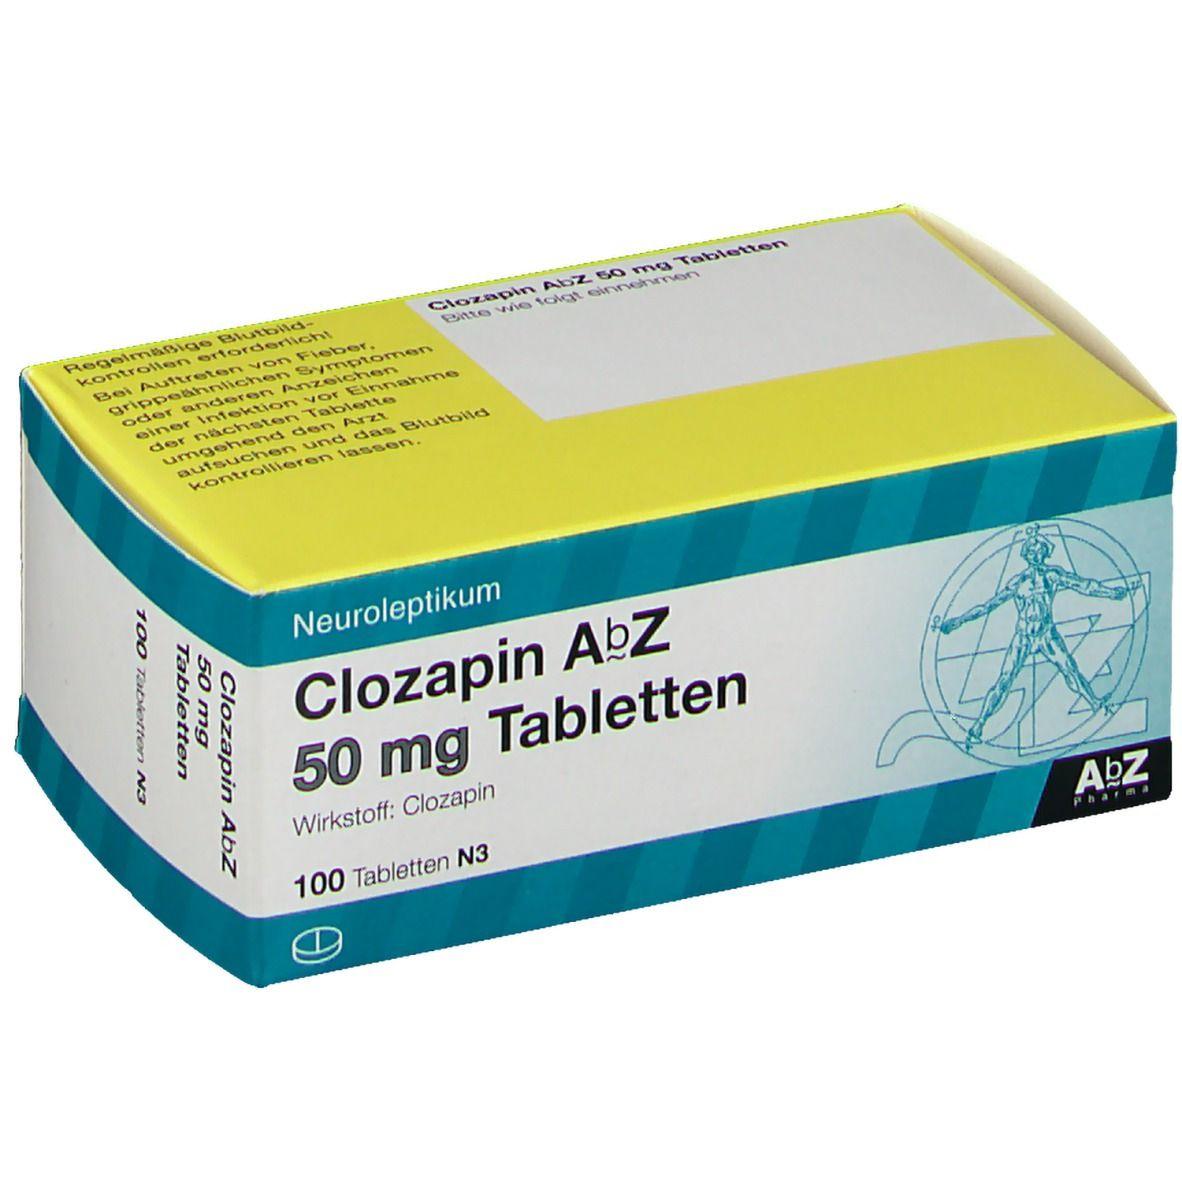 Clozapin AbZ 50 mg